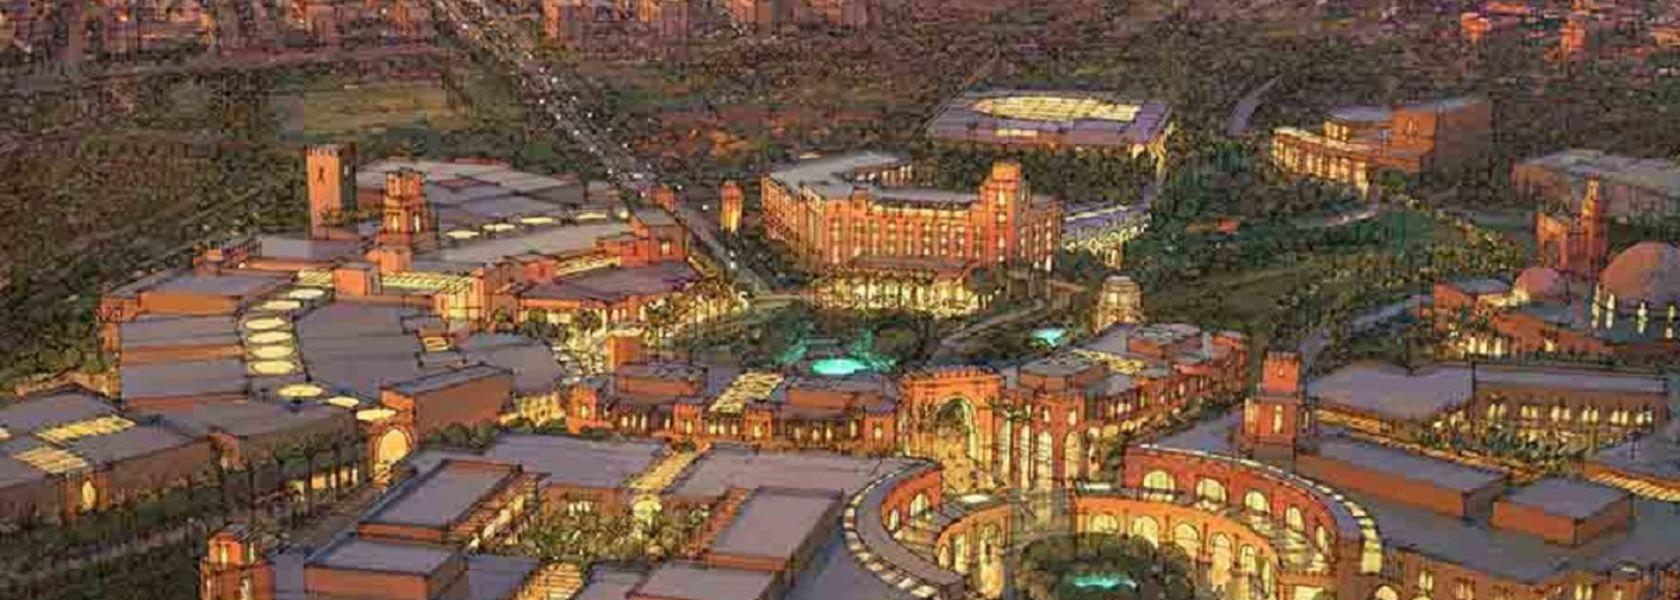 Saudi Arabia creating new mining city - Mining Journal